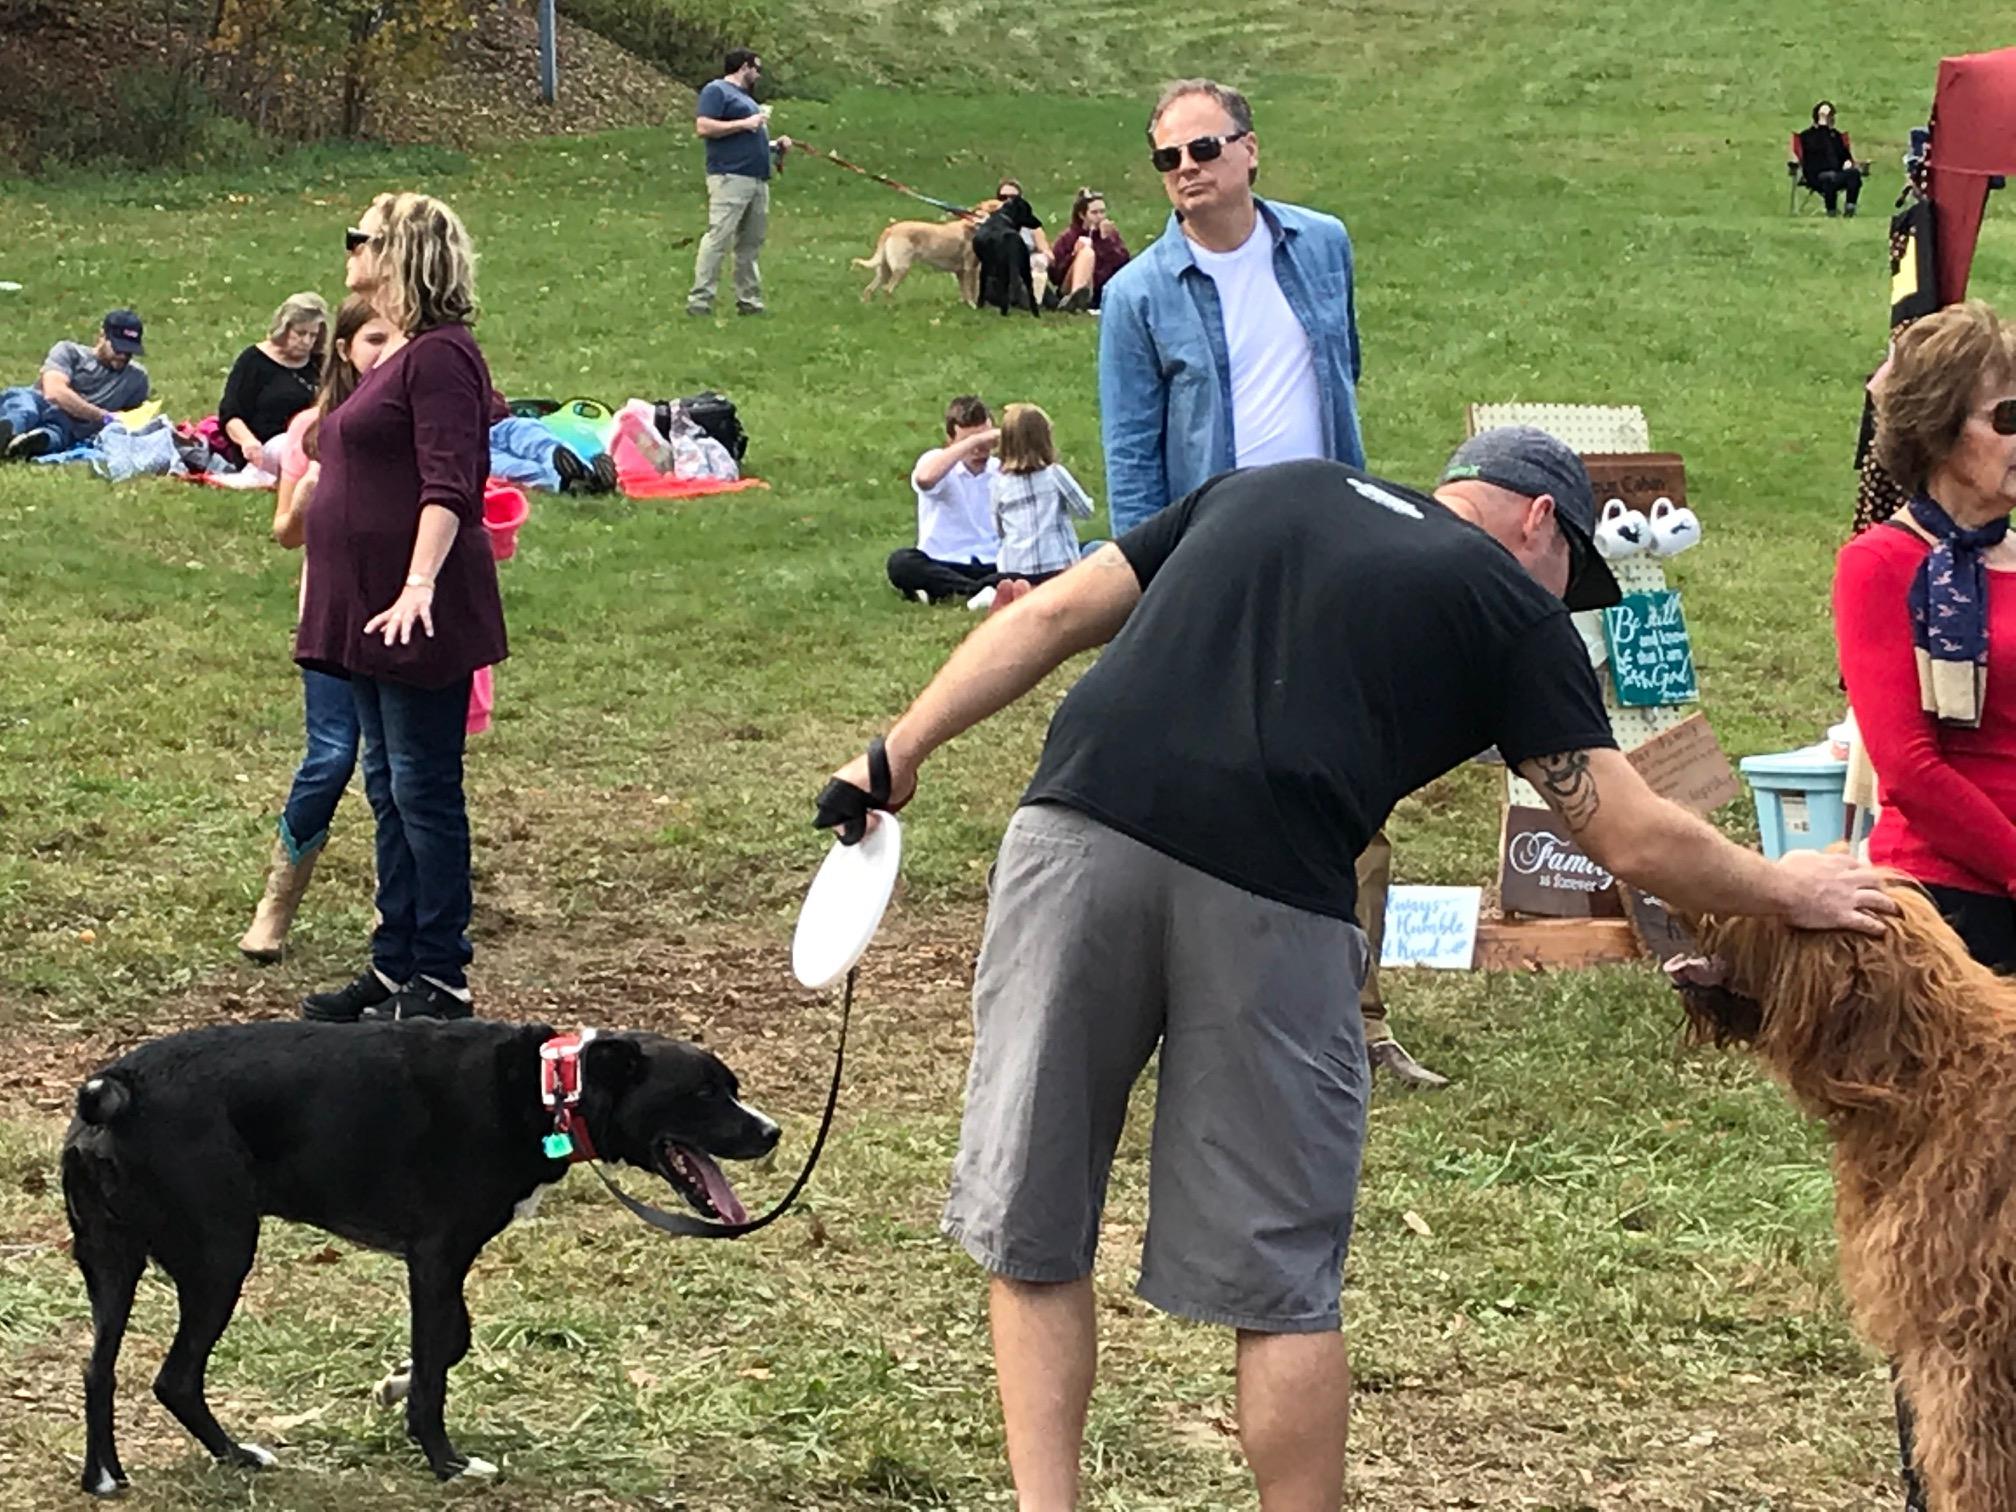 frisbee dog.jpg